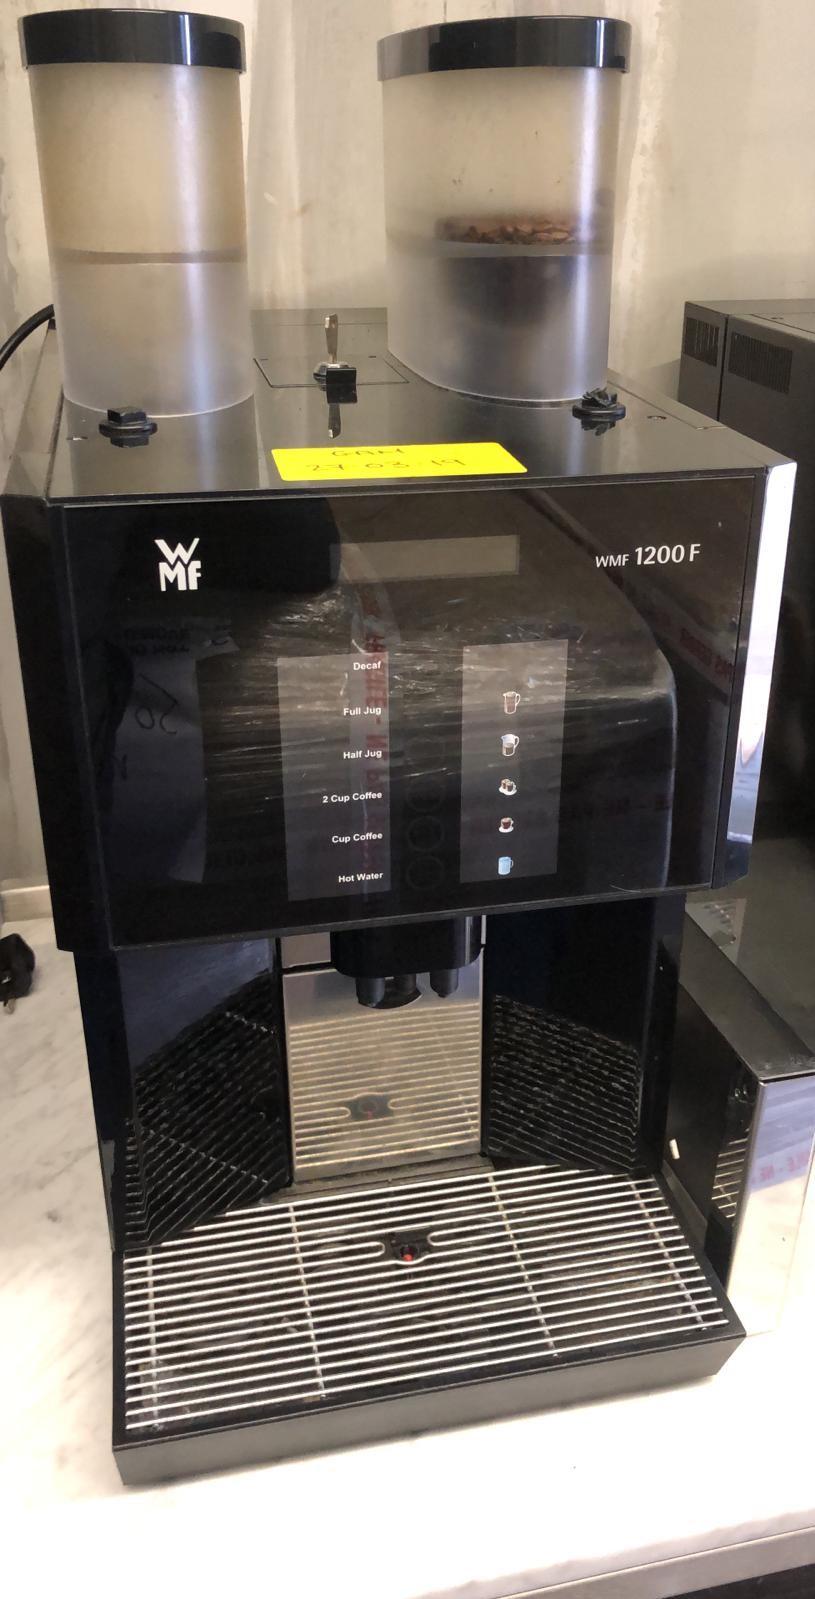 WMF 1200 F Double Silo Bean to Cup Coffee Machine